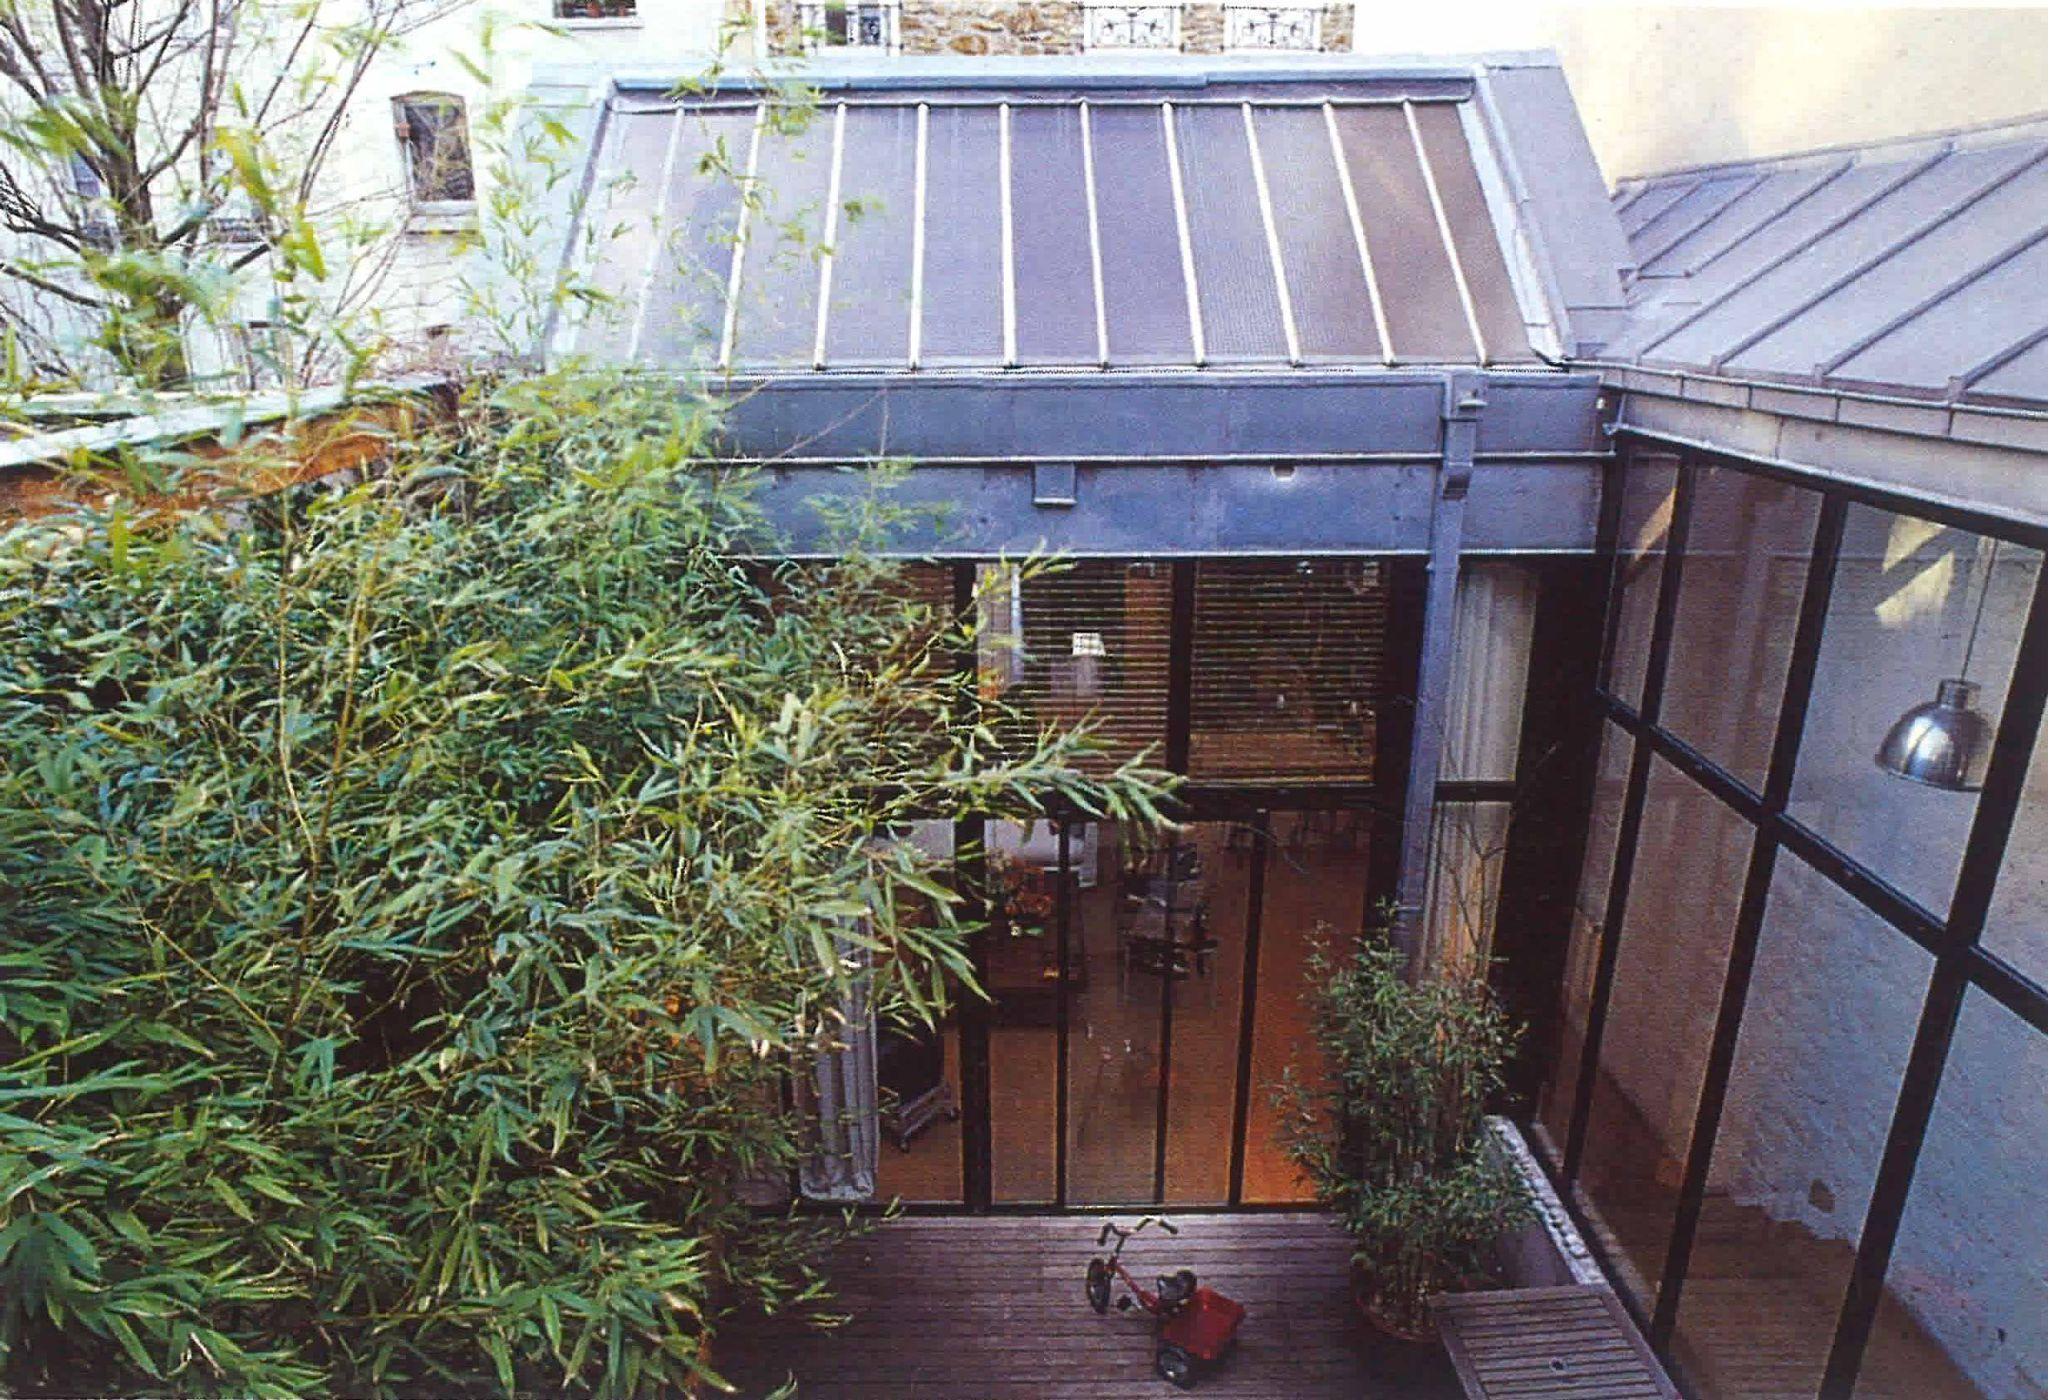 Transvaal PCA-STREAM volumes verrière patio vue extérieure